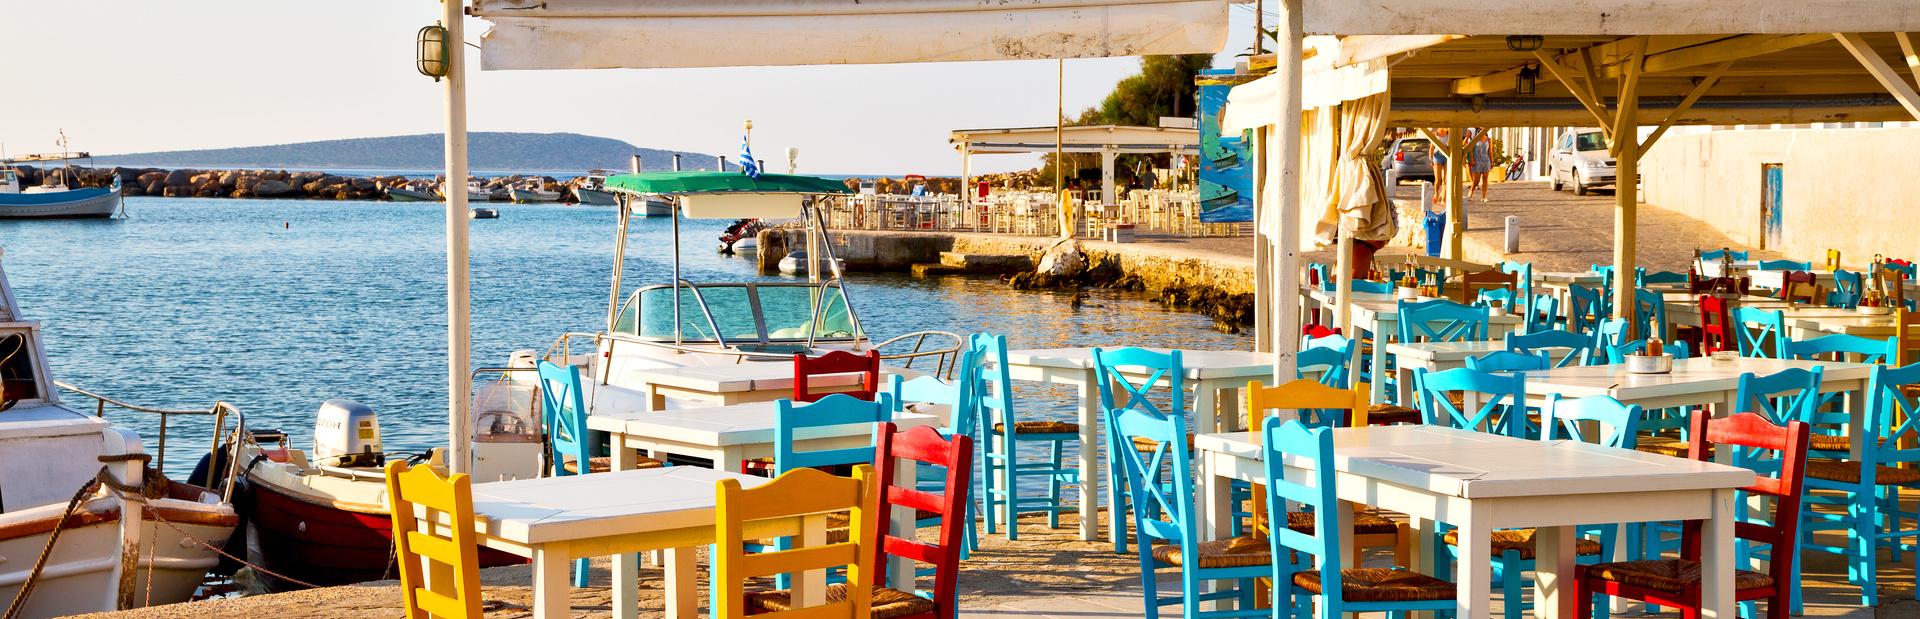 Santorini news photo